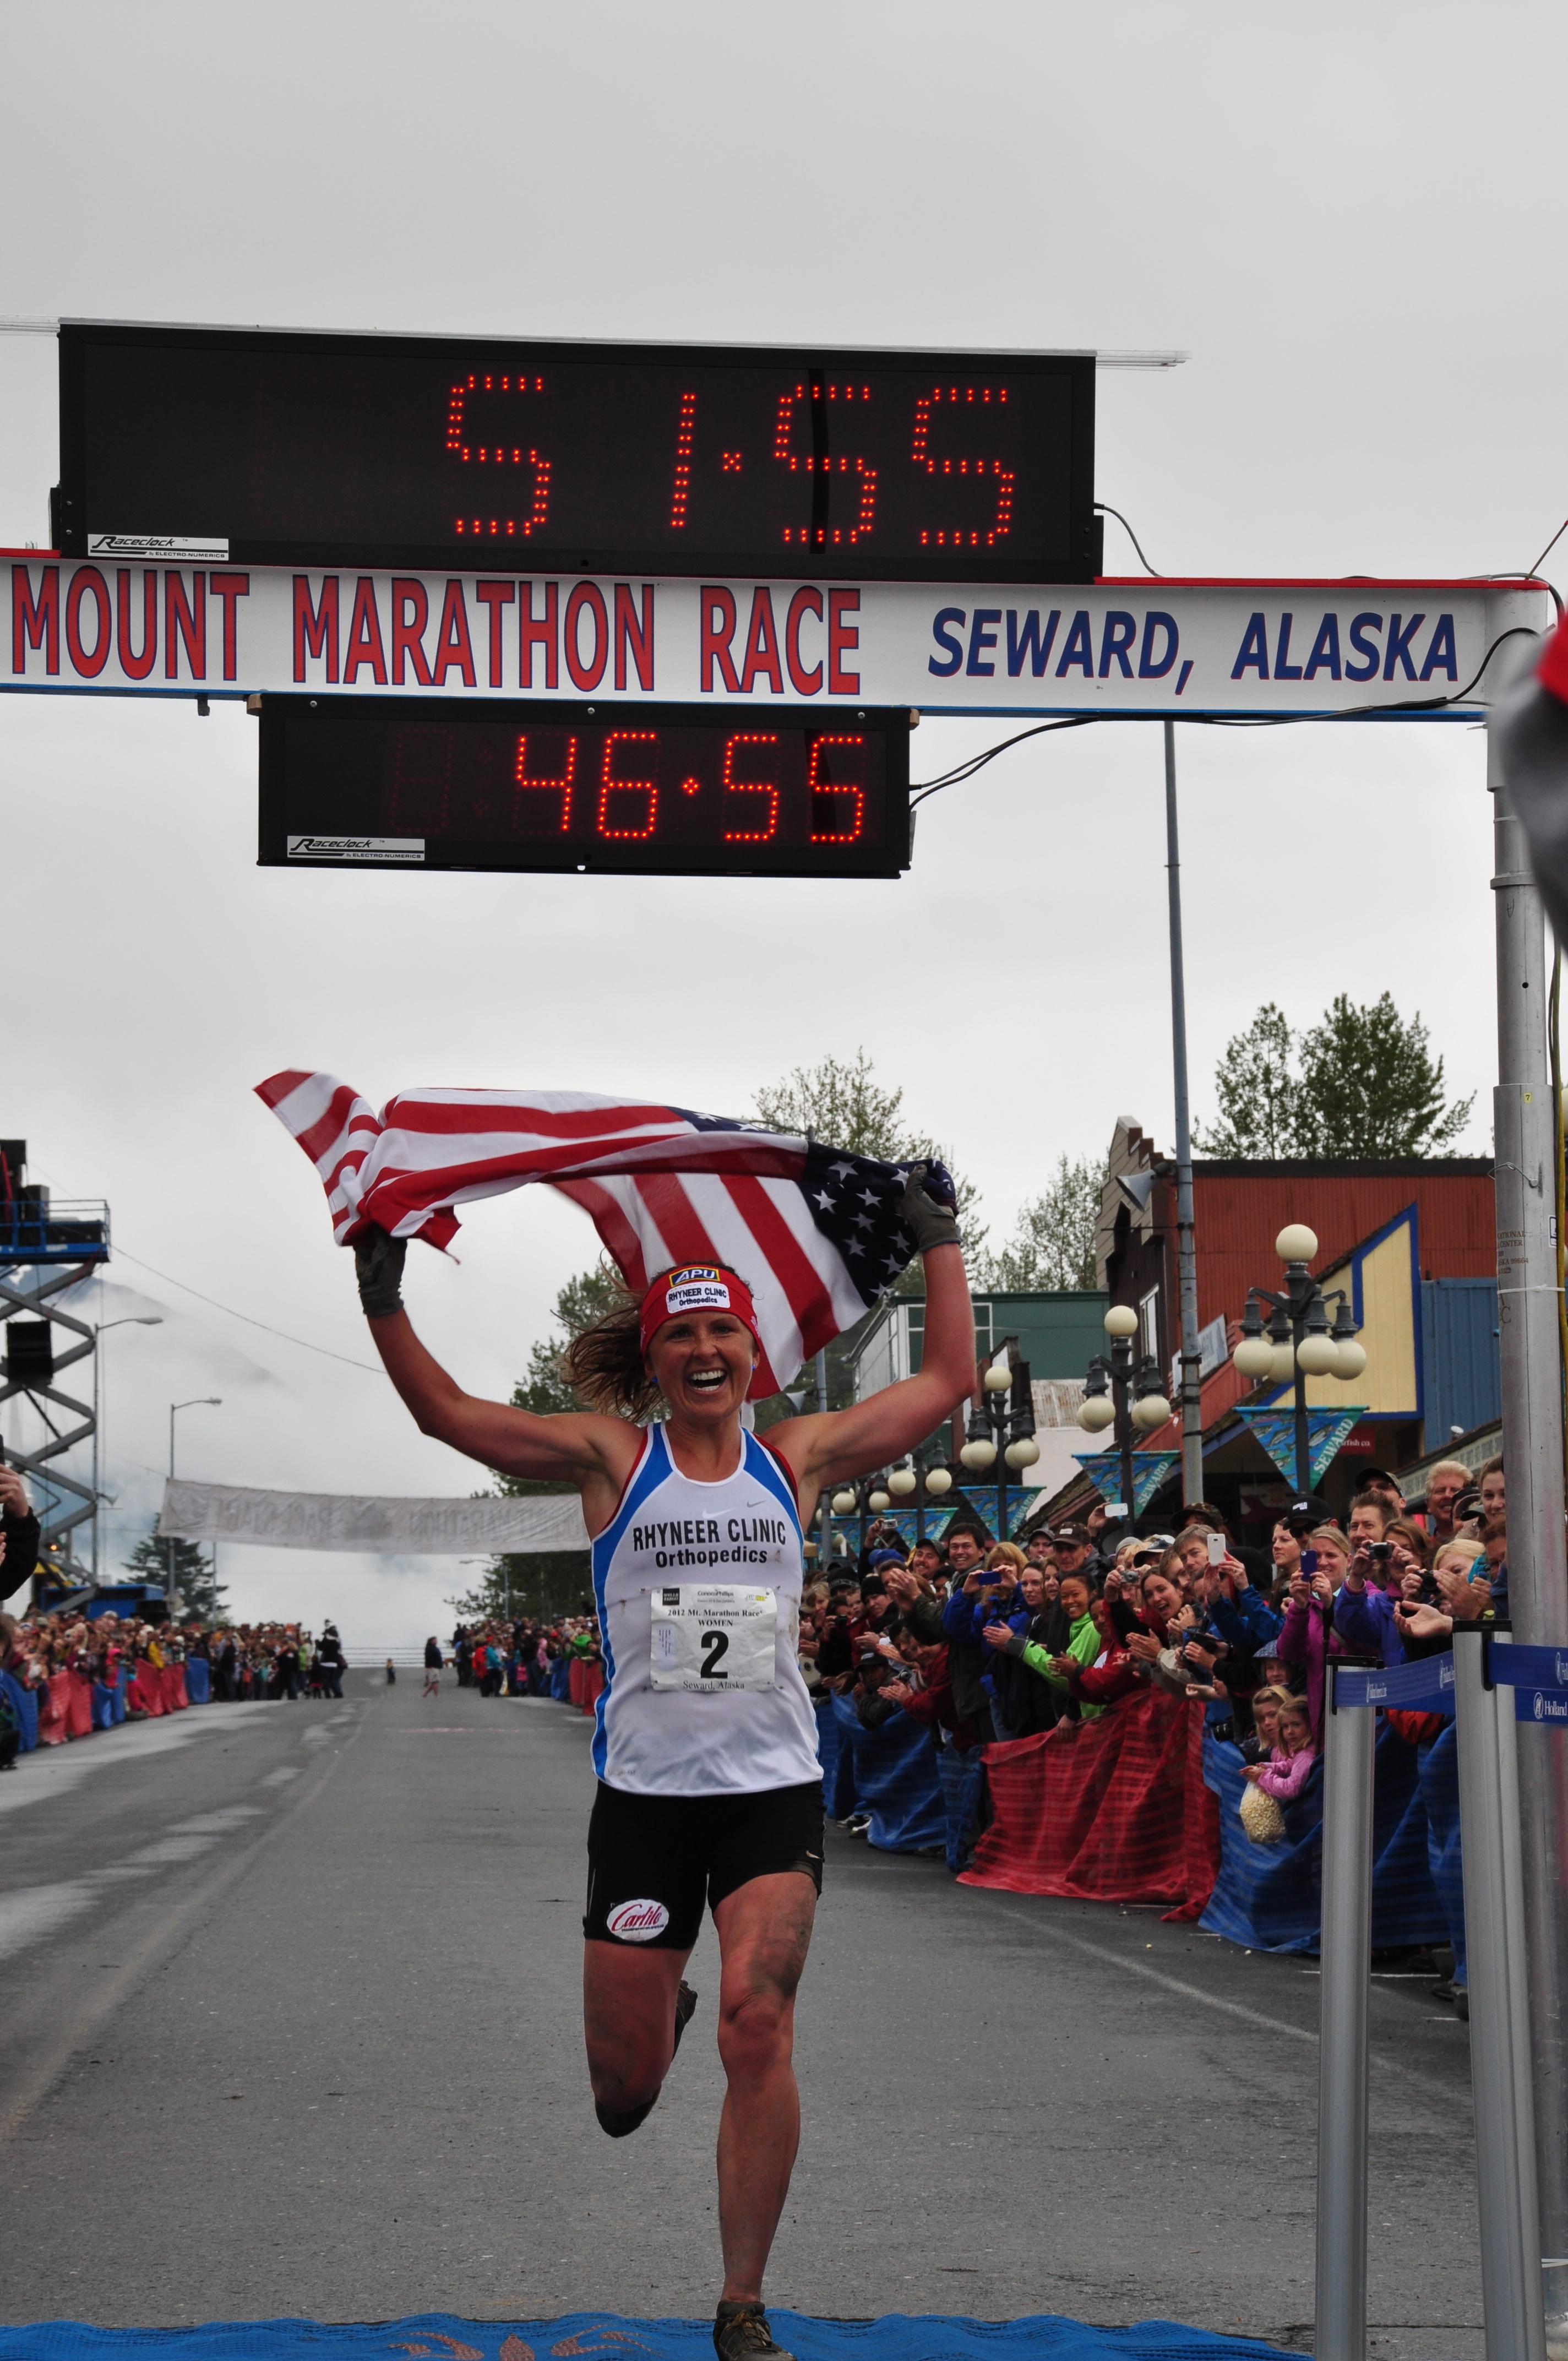 https://fasterskier.com/wp-content/blogs.dir/1/files/2012/07/Mt.-Marathon-Finish-Line.jpg